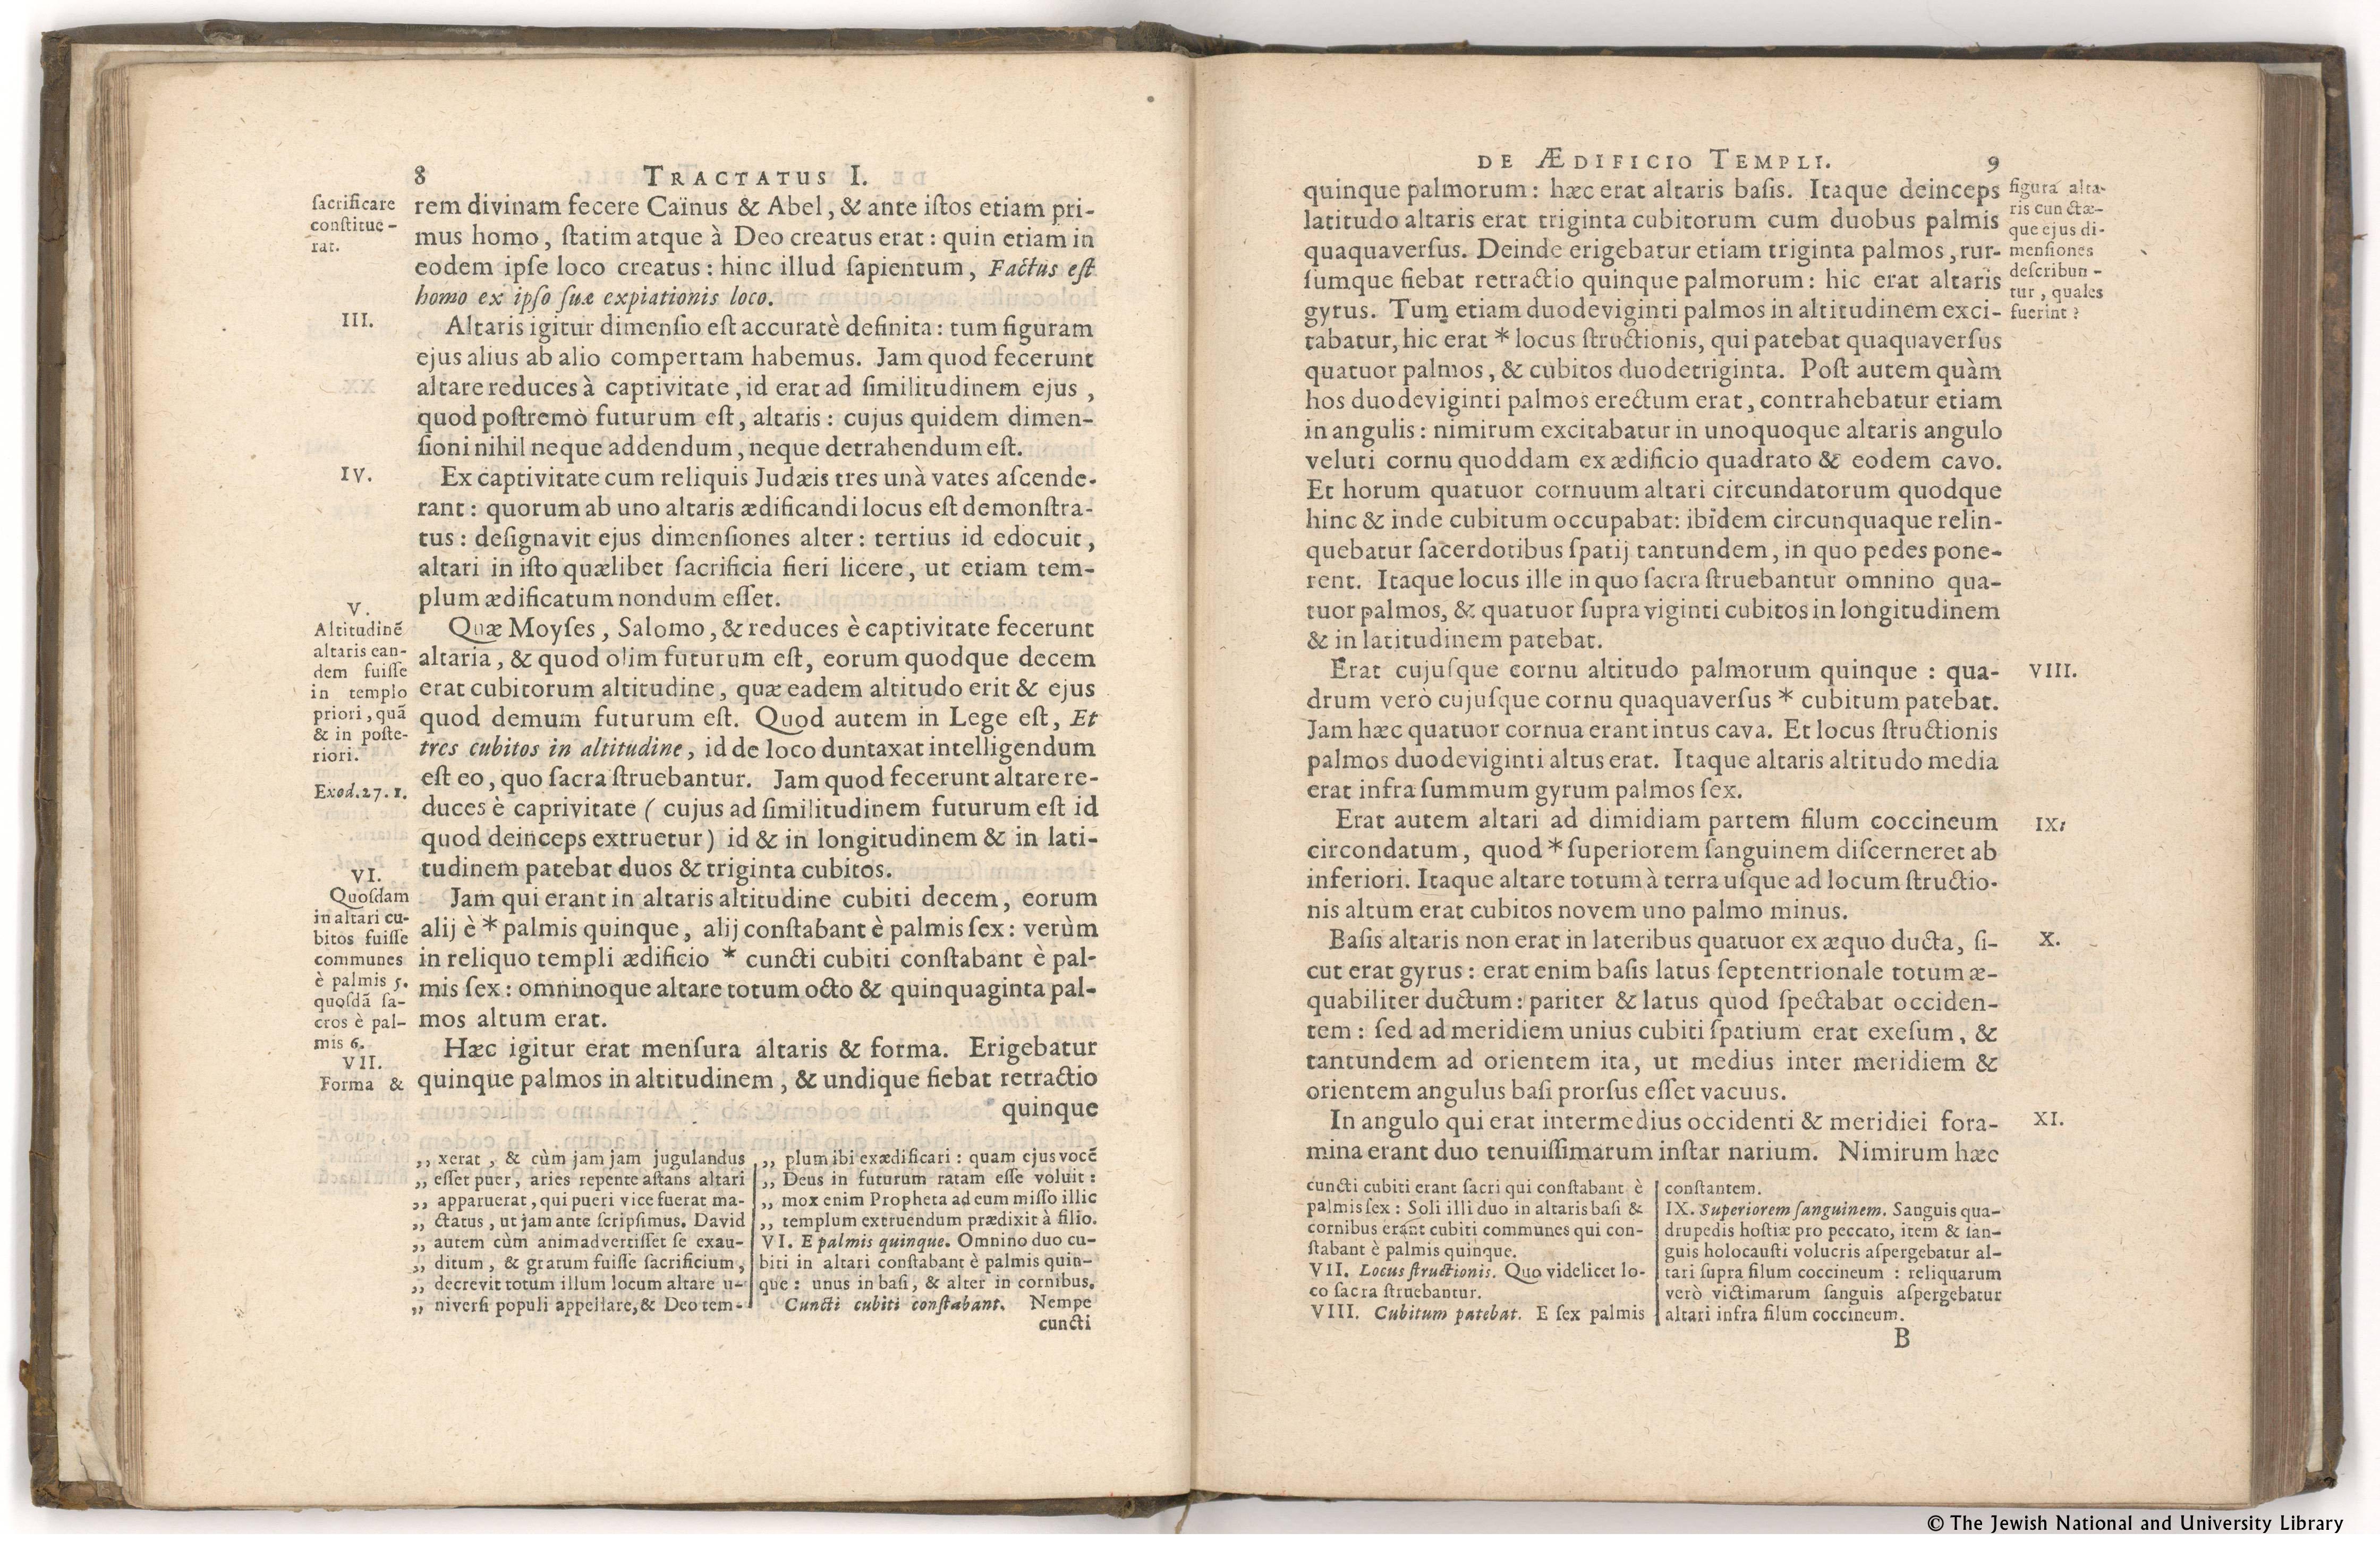 Moshe Ben Maimon (Maimonides) - Mishneh Torah, Sefer Avodah, 1678, the National Library of Israel collections